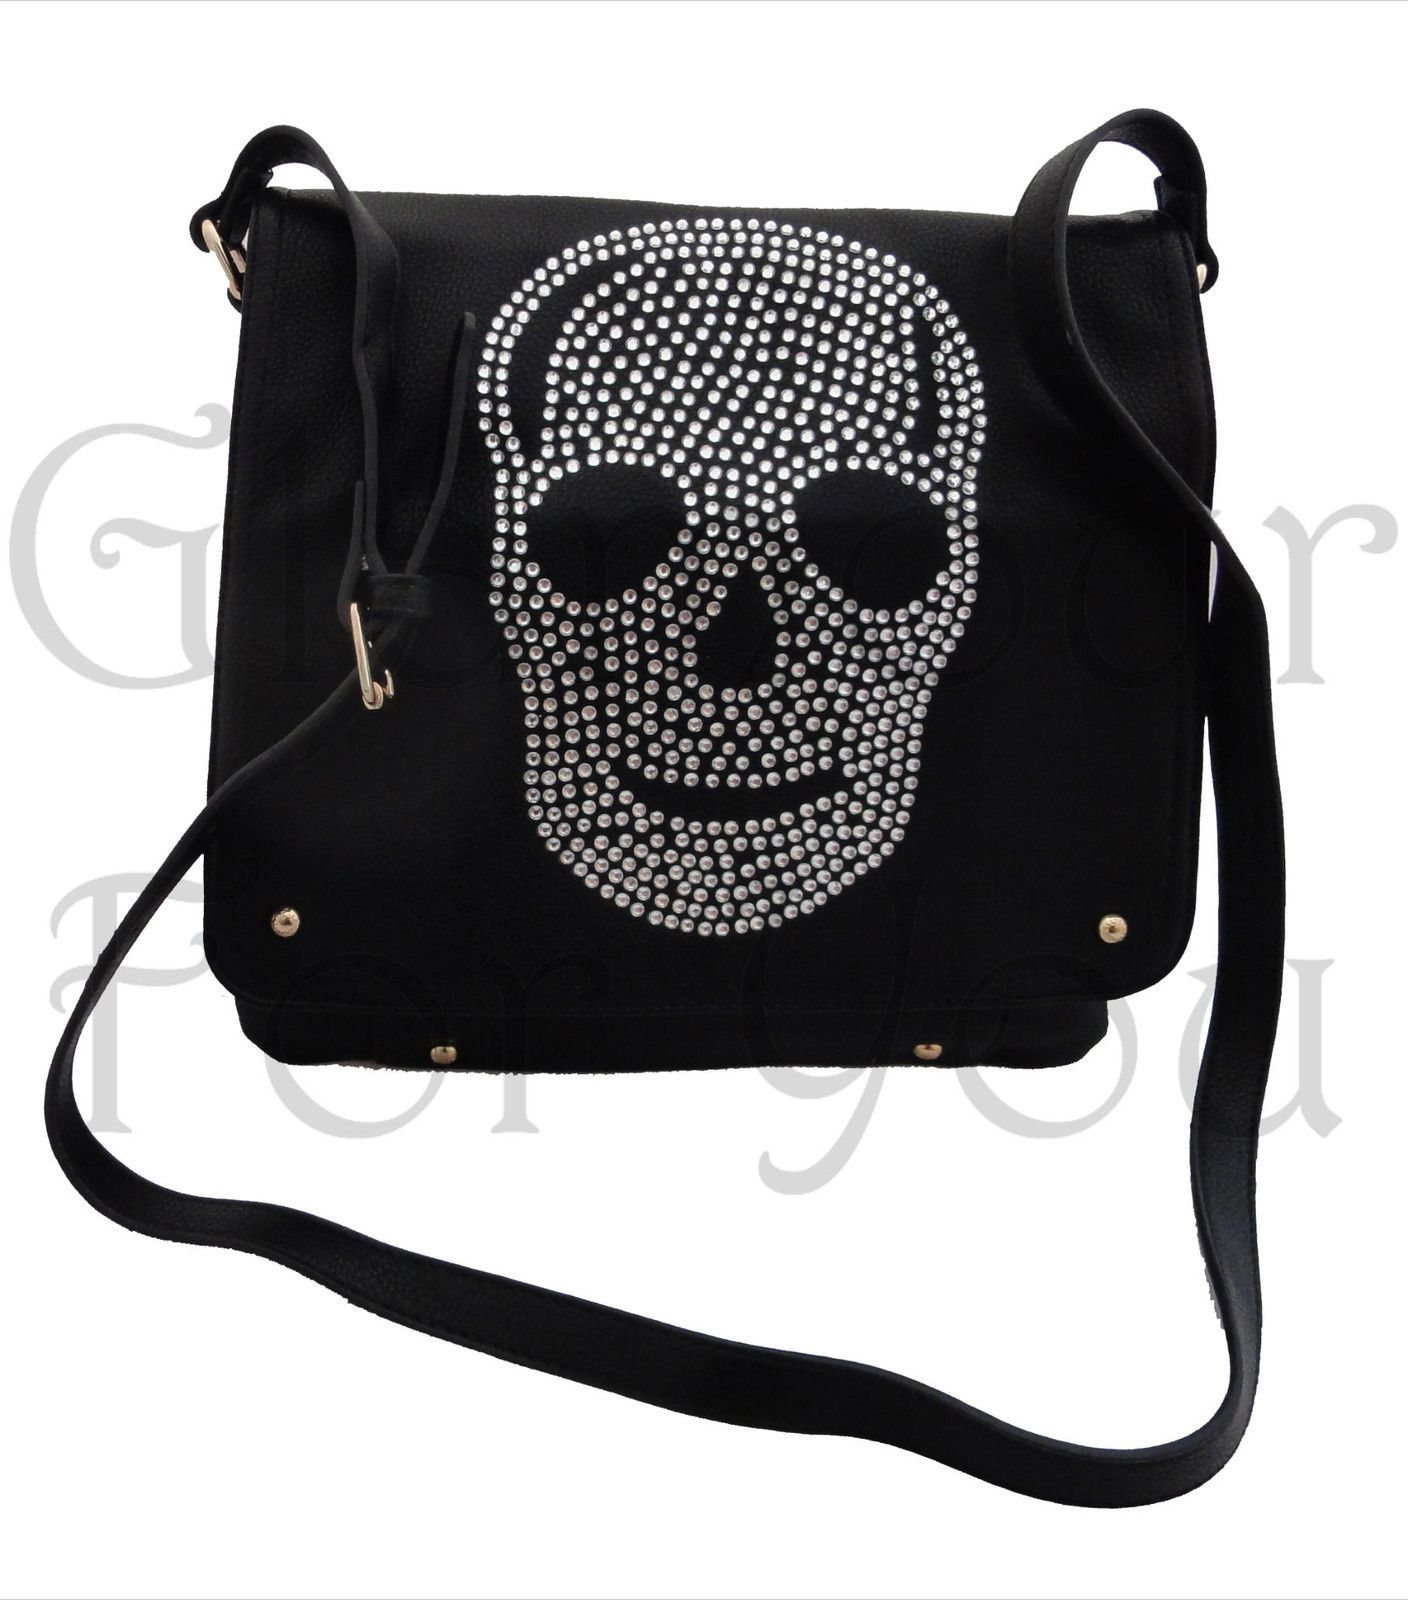 e3d712cfb907 Genuine LYDC DIAMANTE SKULL Celebrity Bag Faux Leather Satchel Saddle Handbag  BN